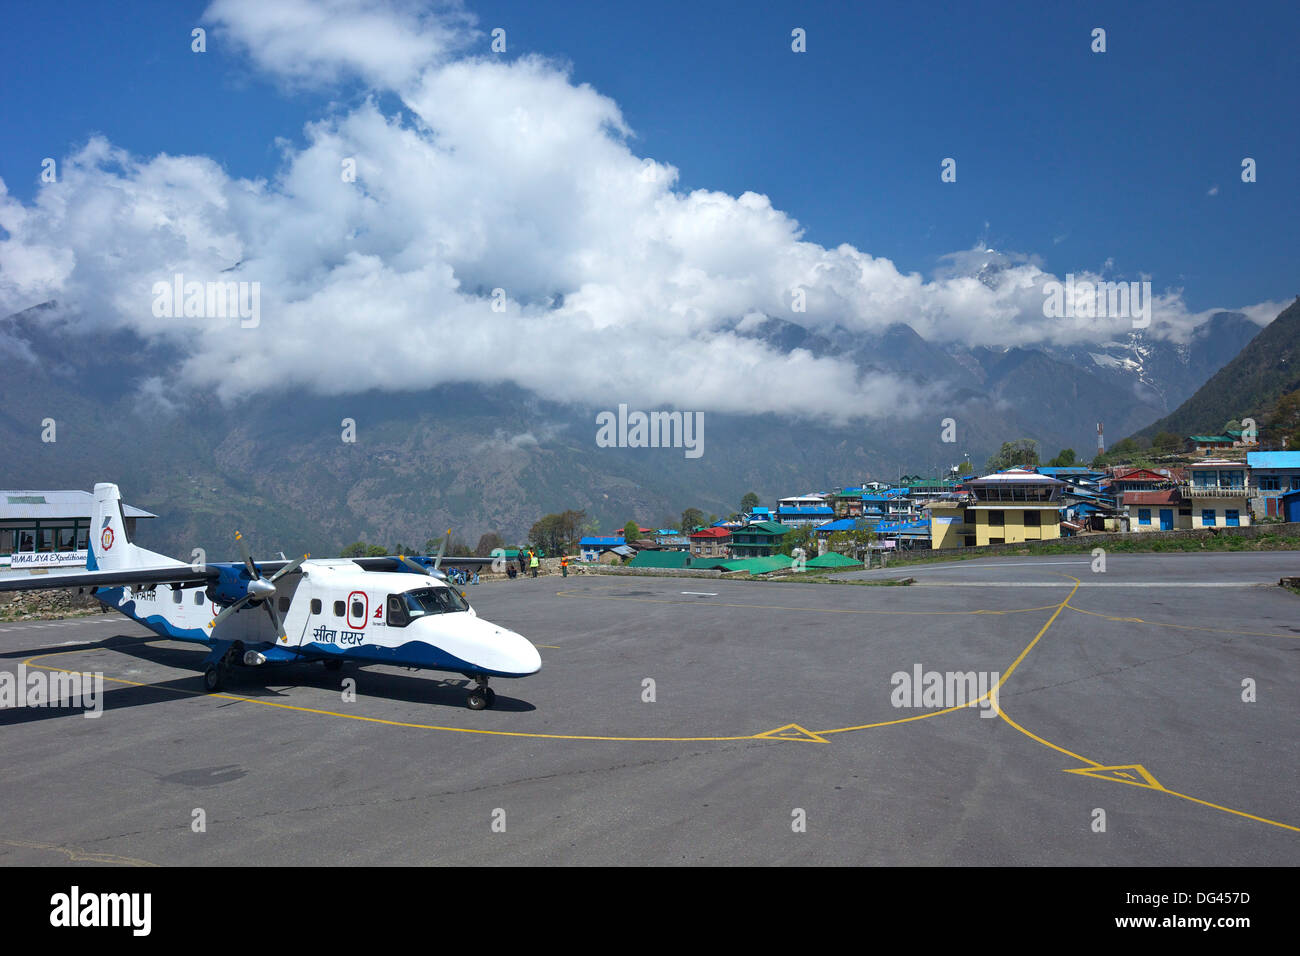 Sita Air Dornier 228 Aircraft approaching runway, Tenzing-Hillary Airport, Lukla, Nepal, Asia - Stock Image